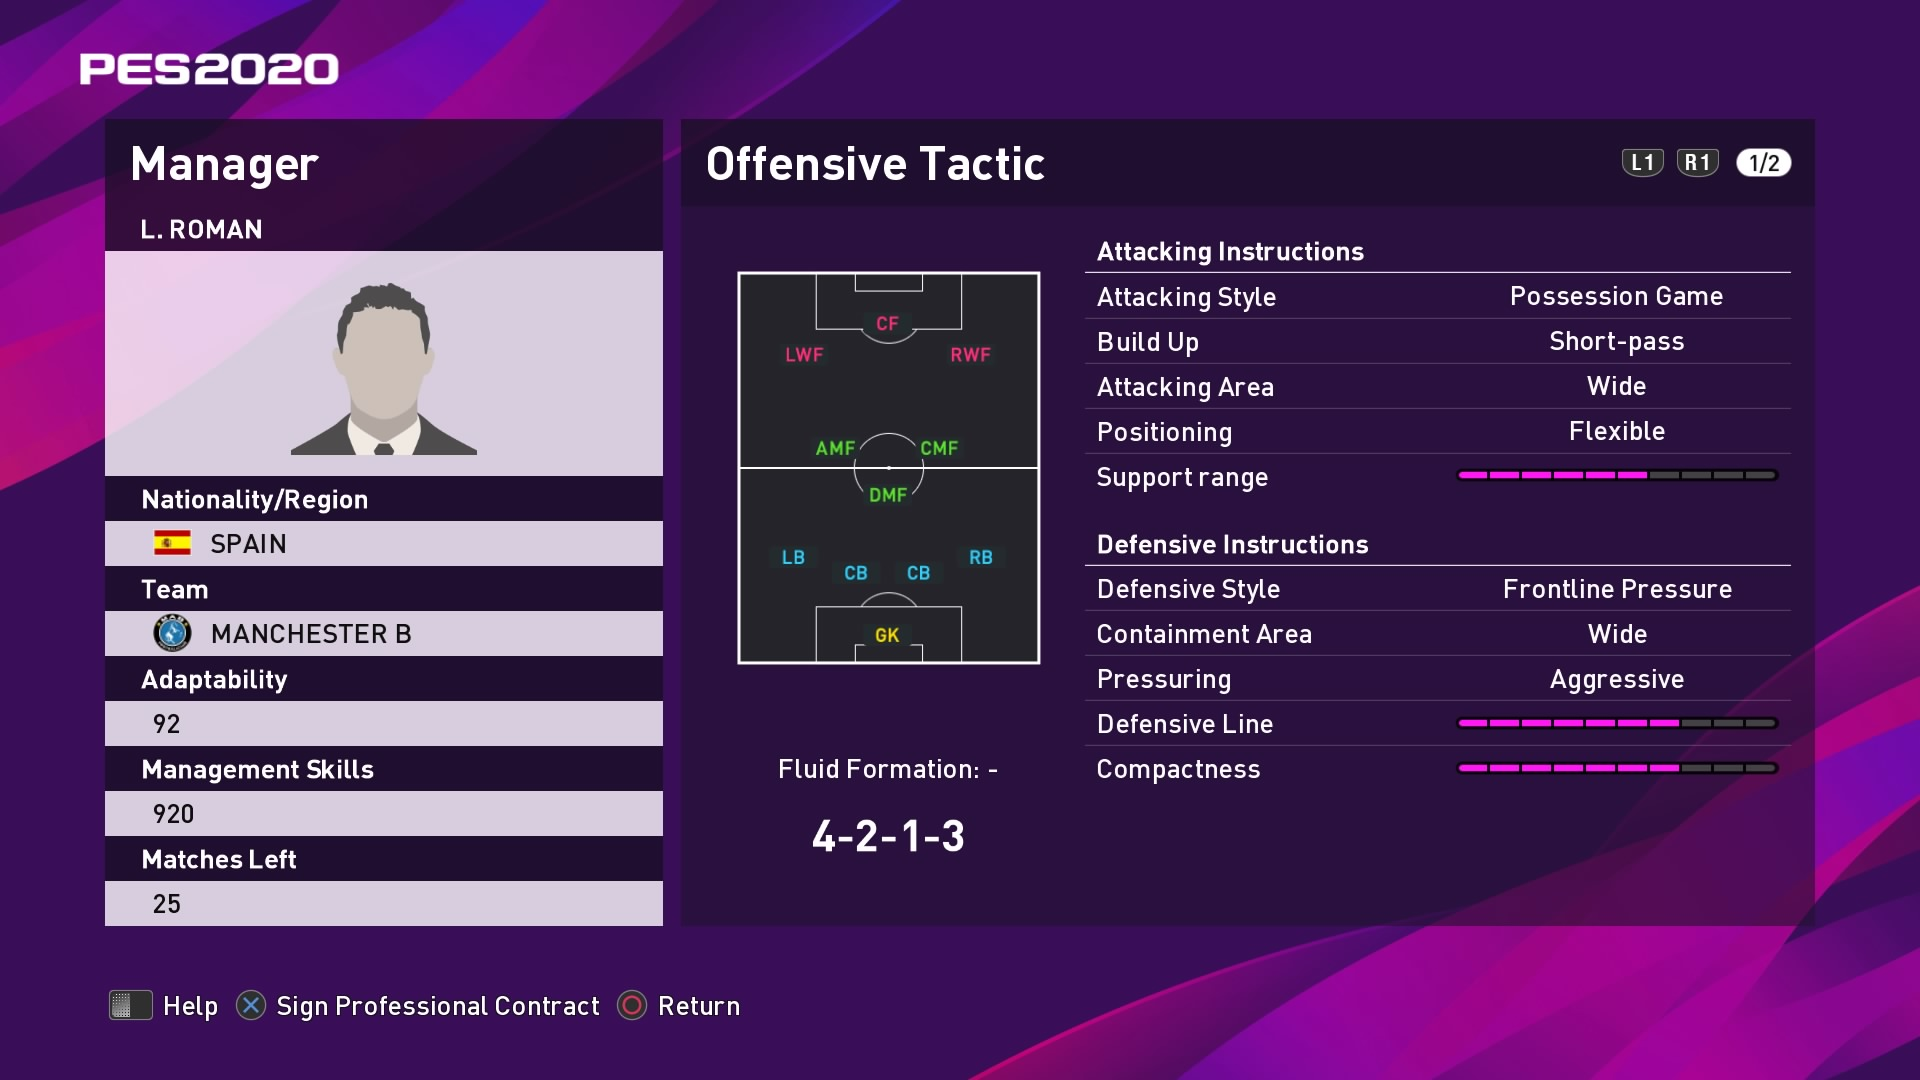 L. Roman (3) (Pep Guardiola) Offensive Tactic in PES 2020 myClub